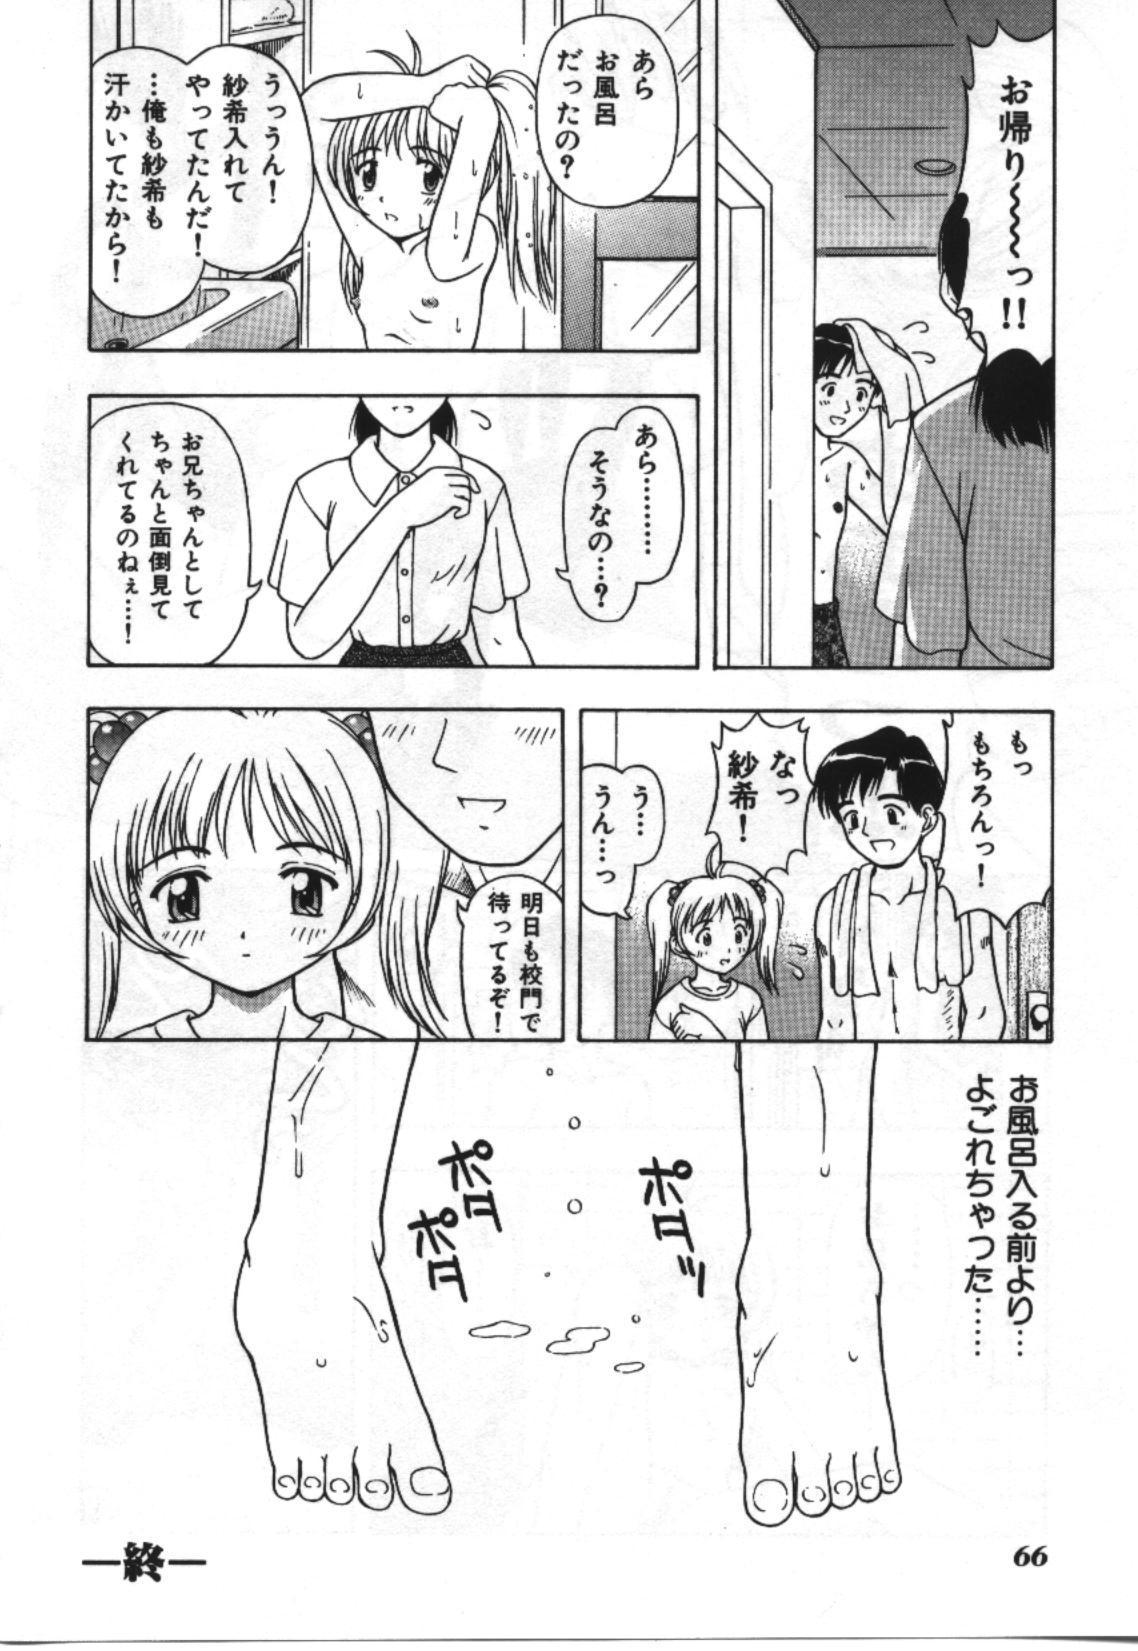 Imouto Koishi 2 65